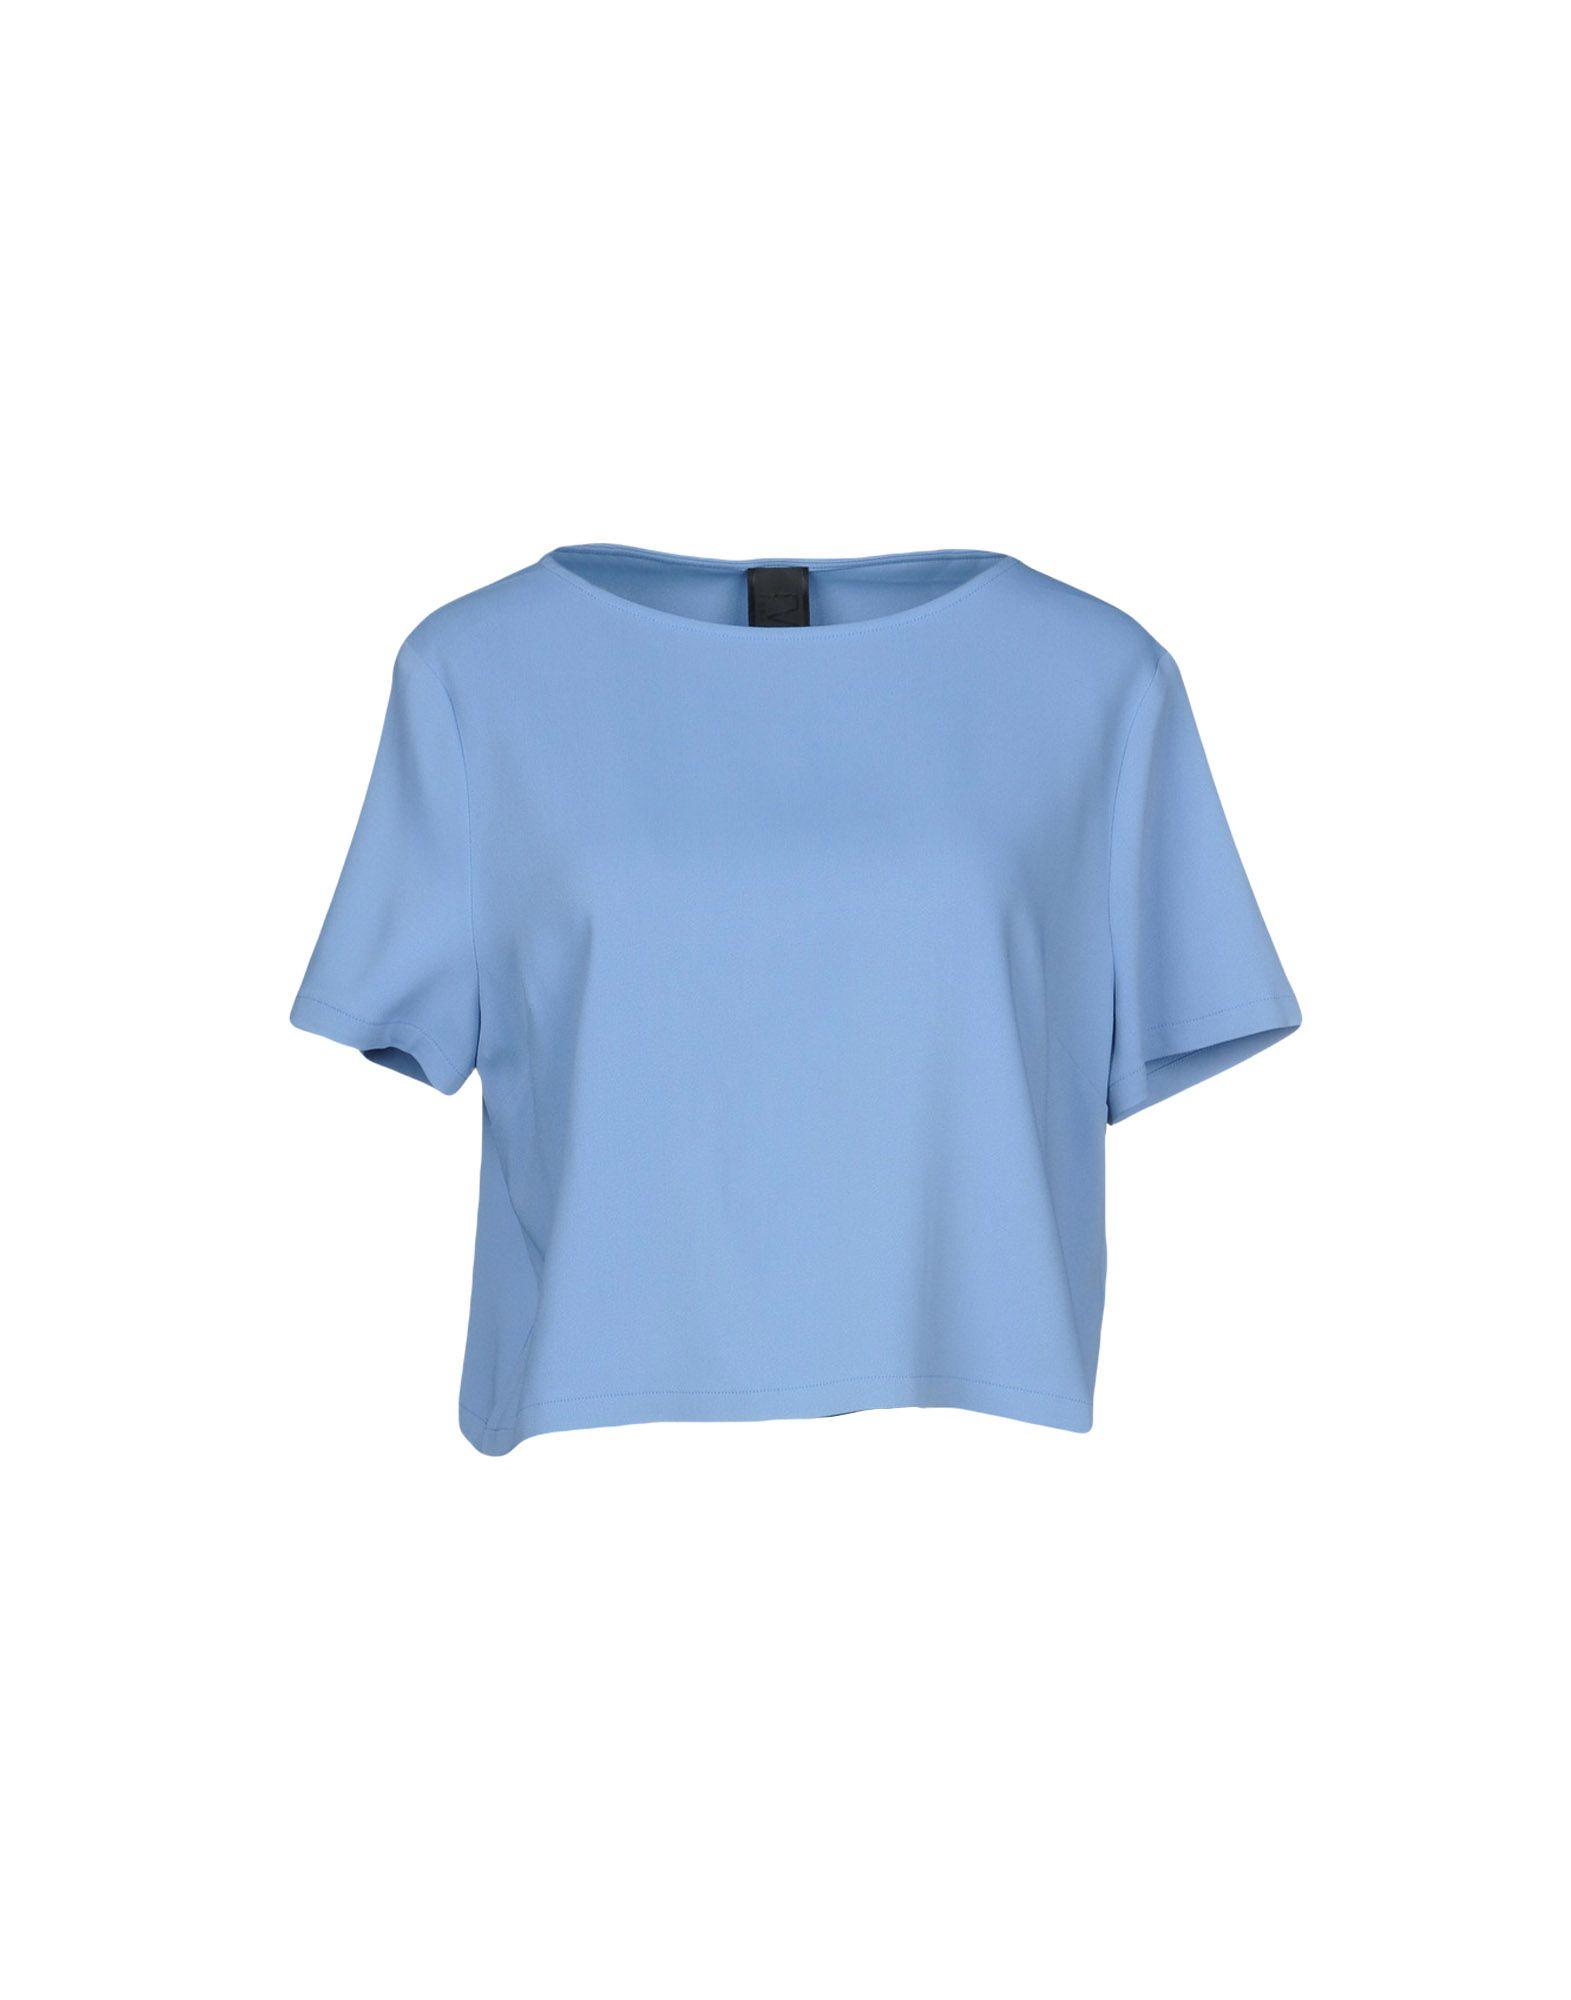 TWISTY PARALLEL UNIVERSE Блузка twisty parallel universe джинсовая верхняя одежда